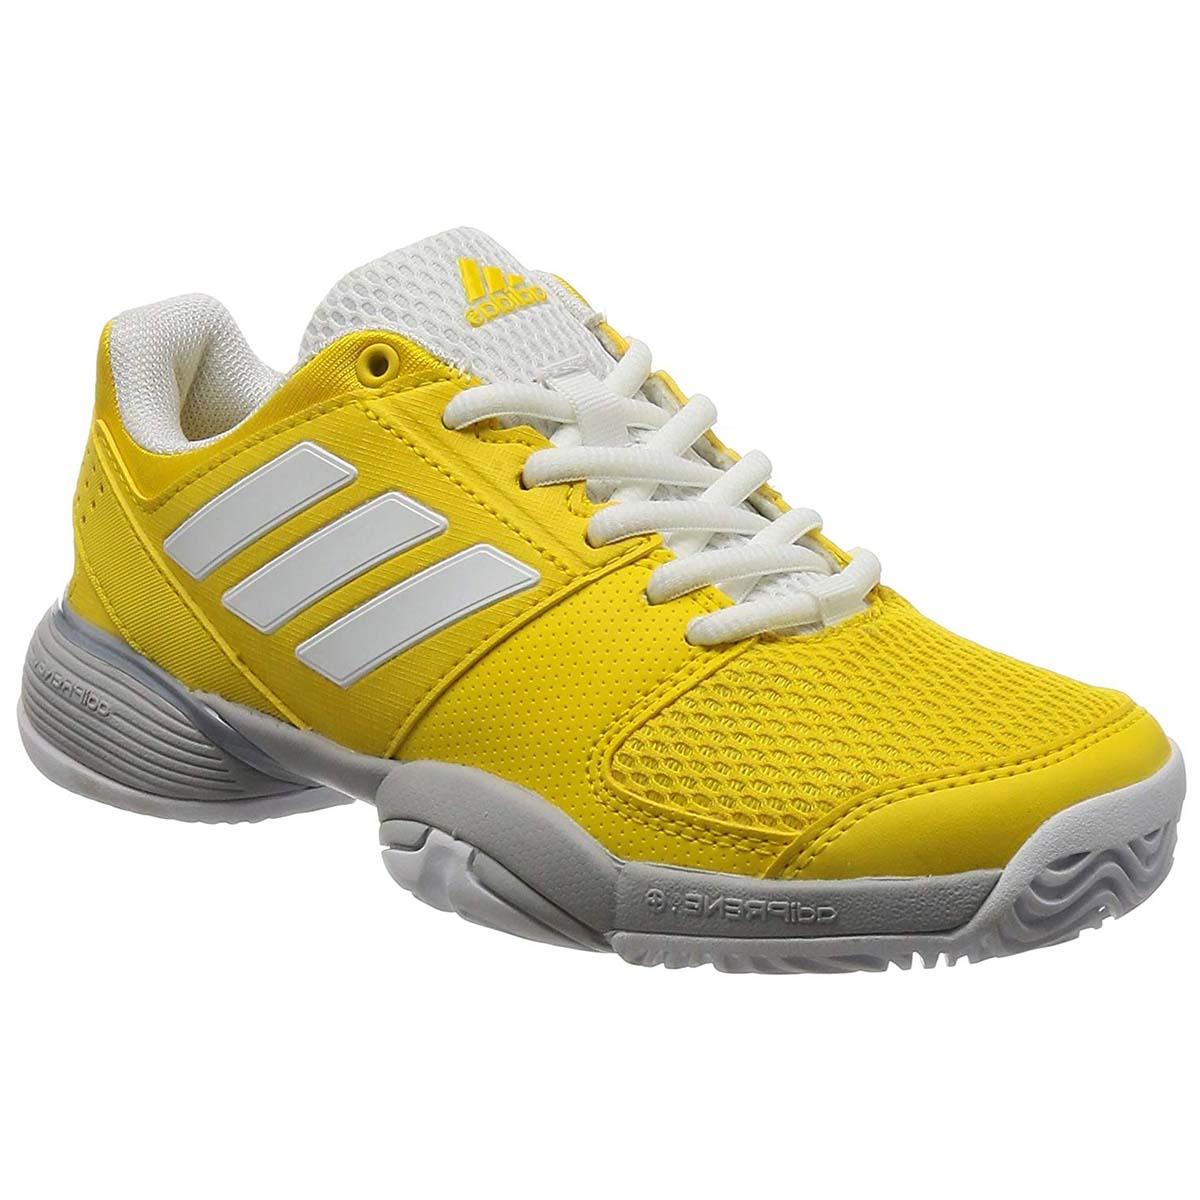 meet 9351a 54bb0 Buy Adidas Barricade Club XJ Low Junior Tennis Shoes Online in India